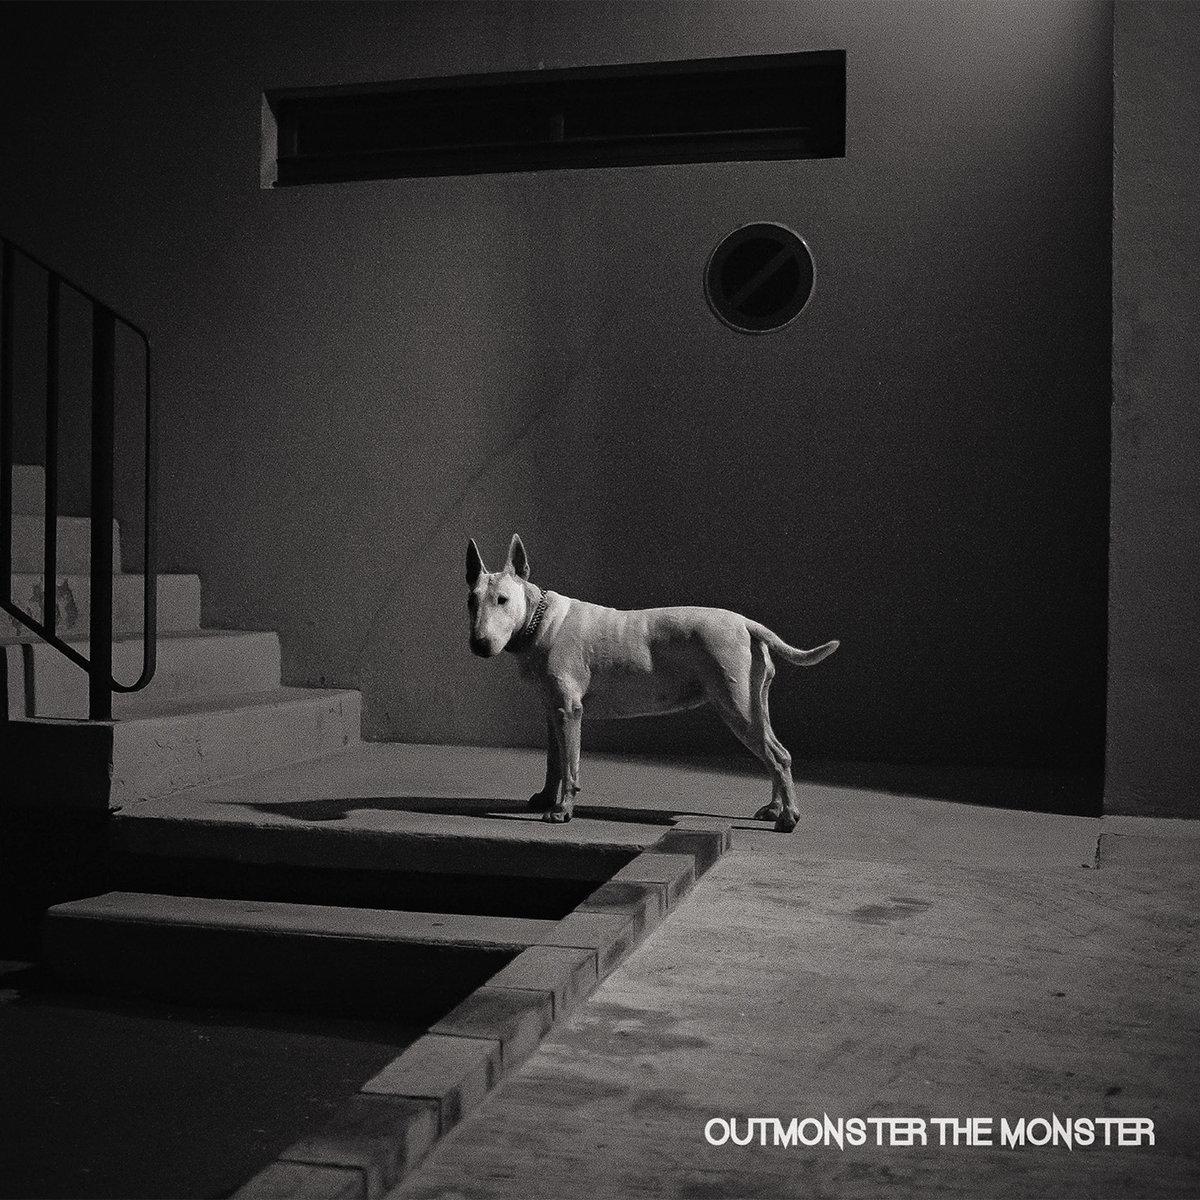 Outmonster the Monster (2016)